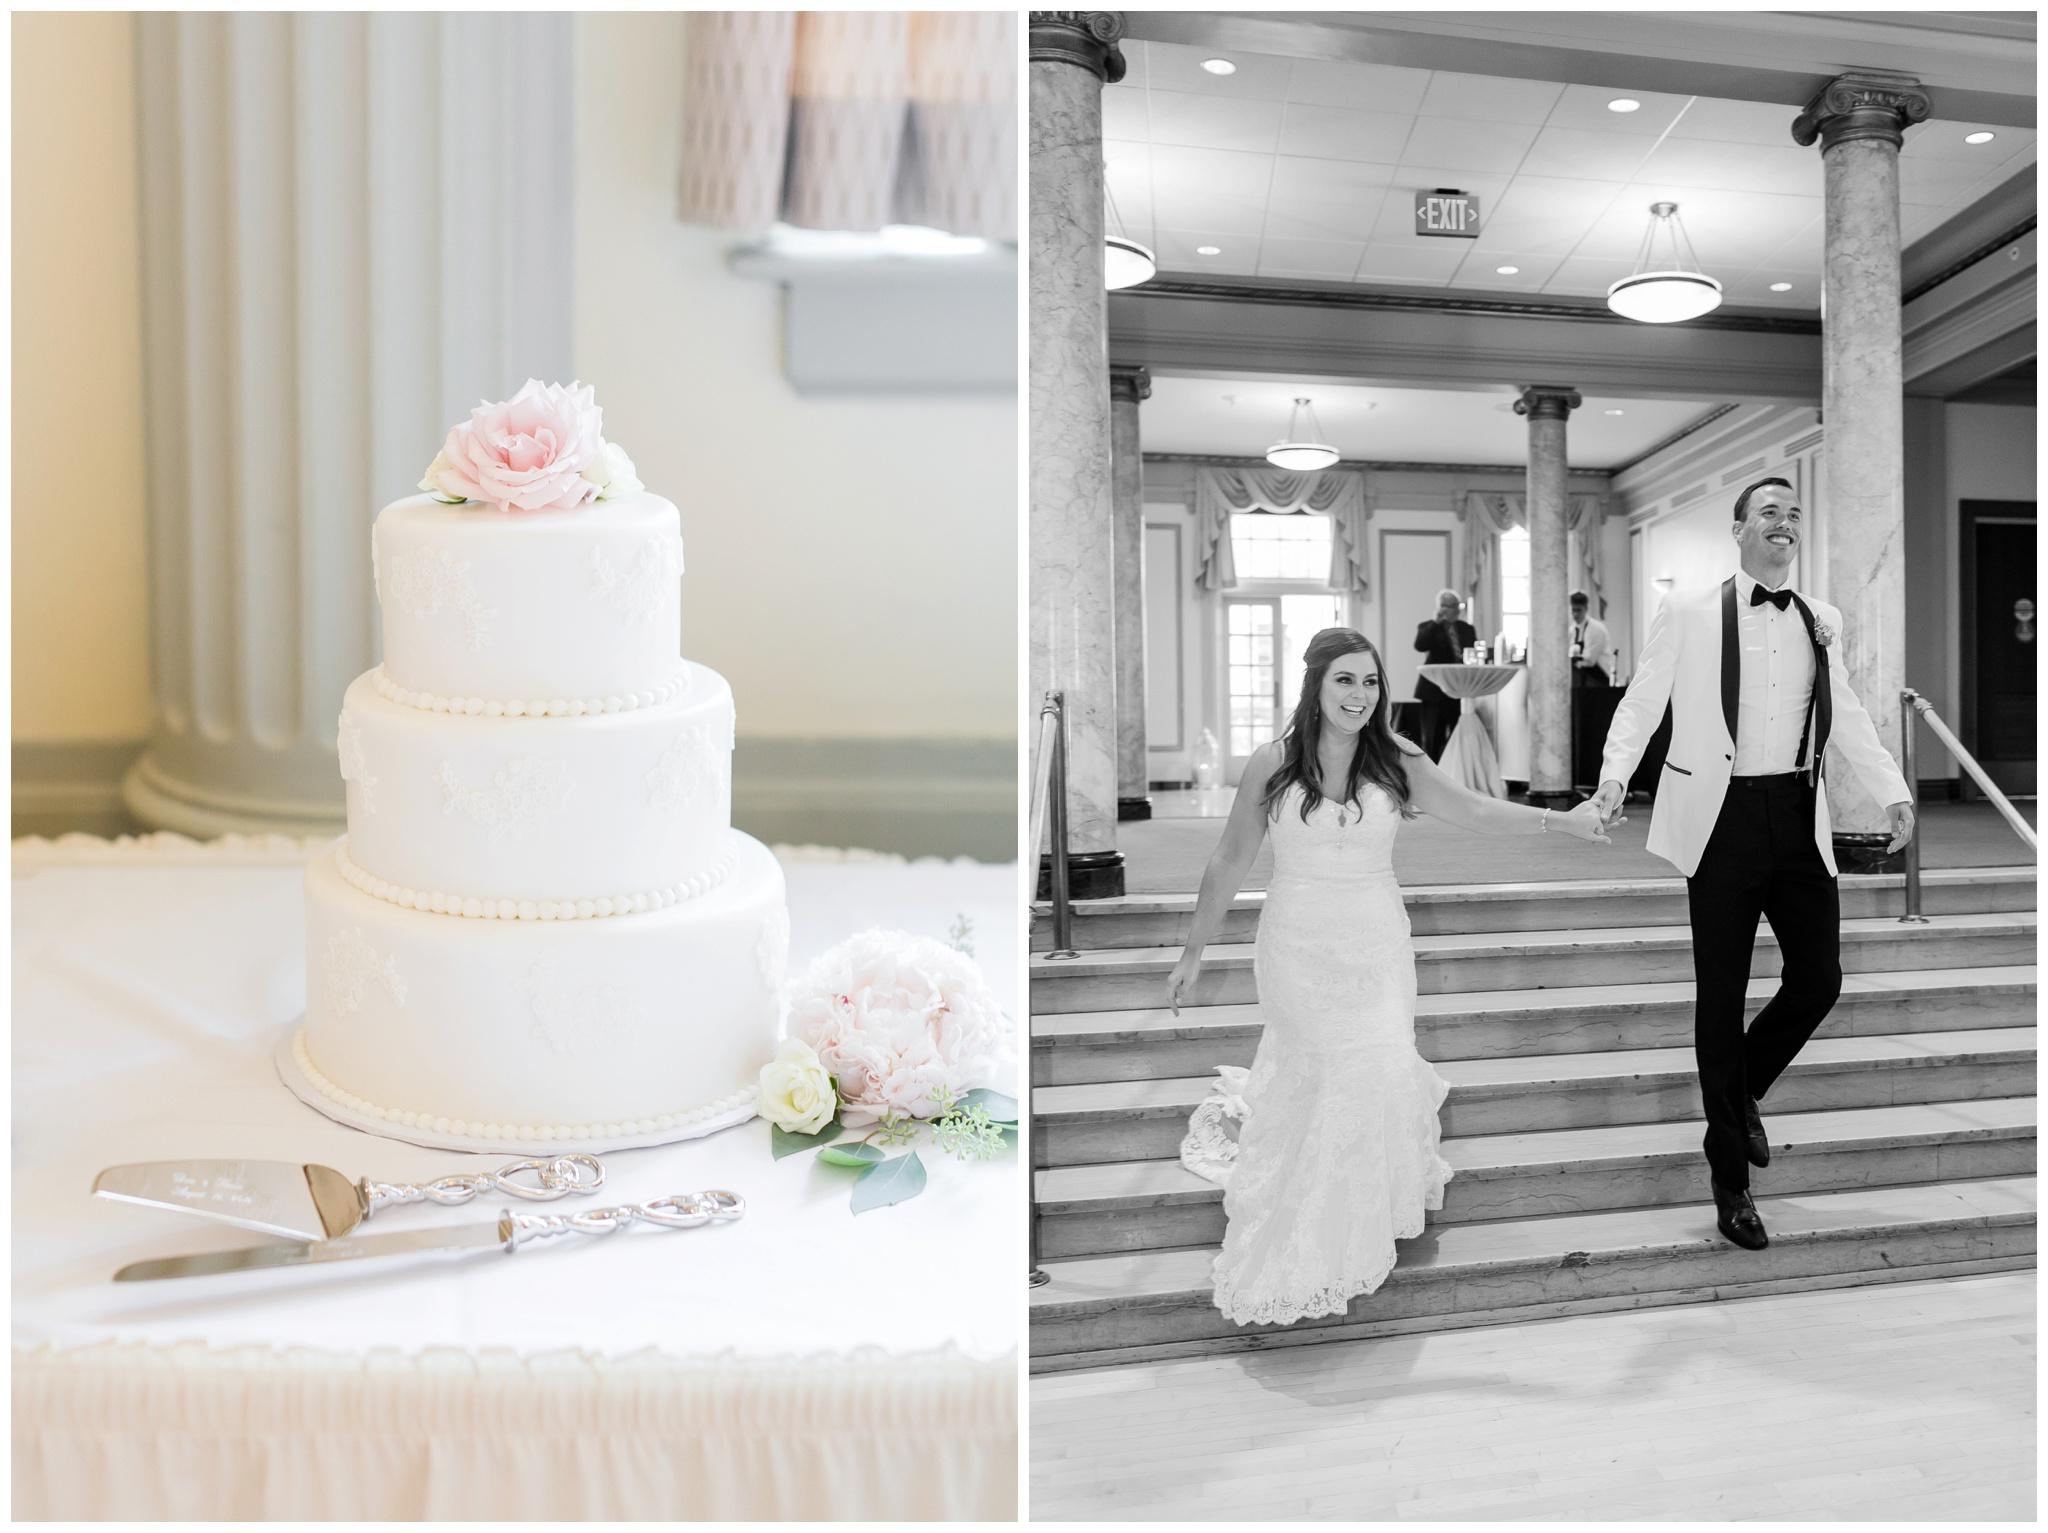 UW_Memorial_Union_wedding_madison_wisconsin_wedding_photographers_4632.jpg